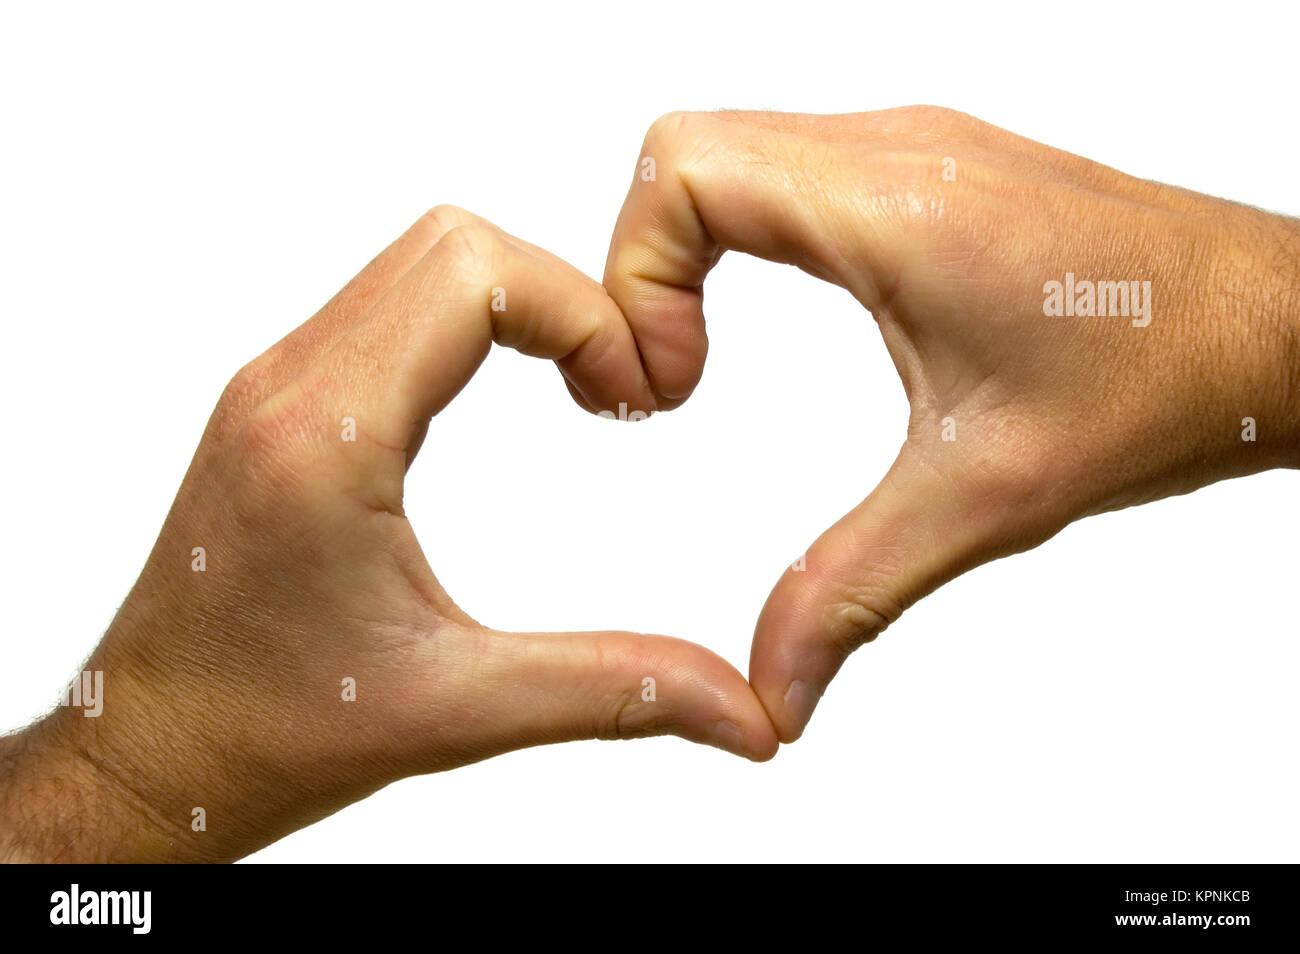 Heart Shaped Hands Stock Photo: 168891979 - Alamy